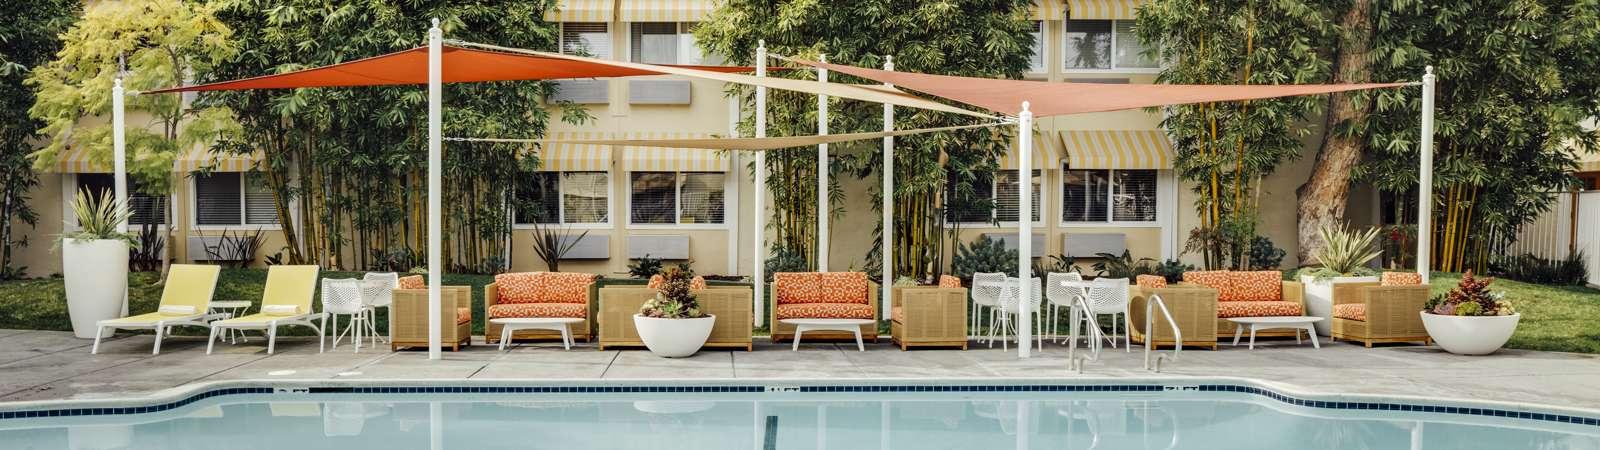 Wild Palms Pool 03 CS